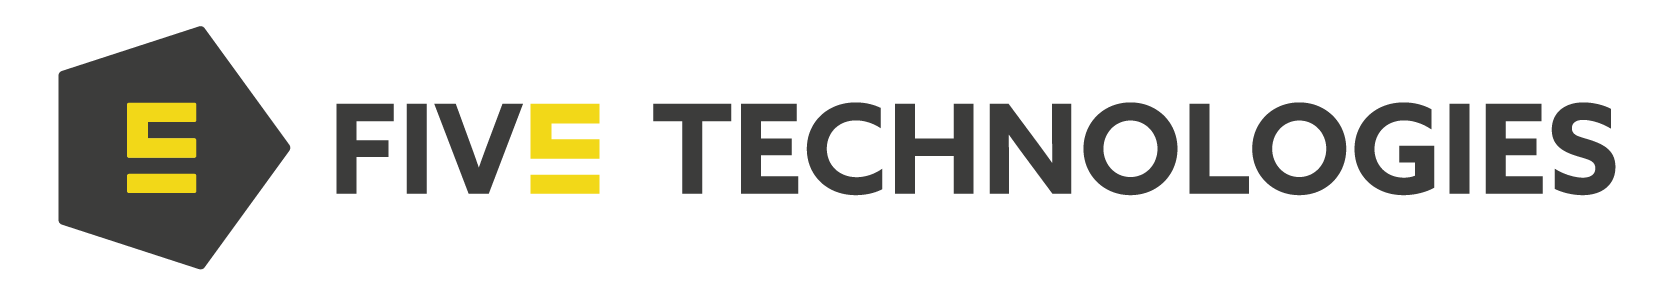 Five Technologies